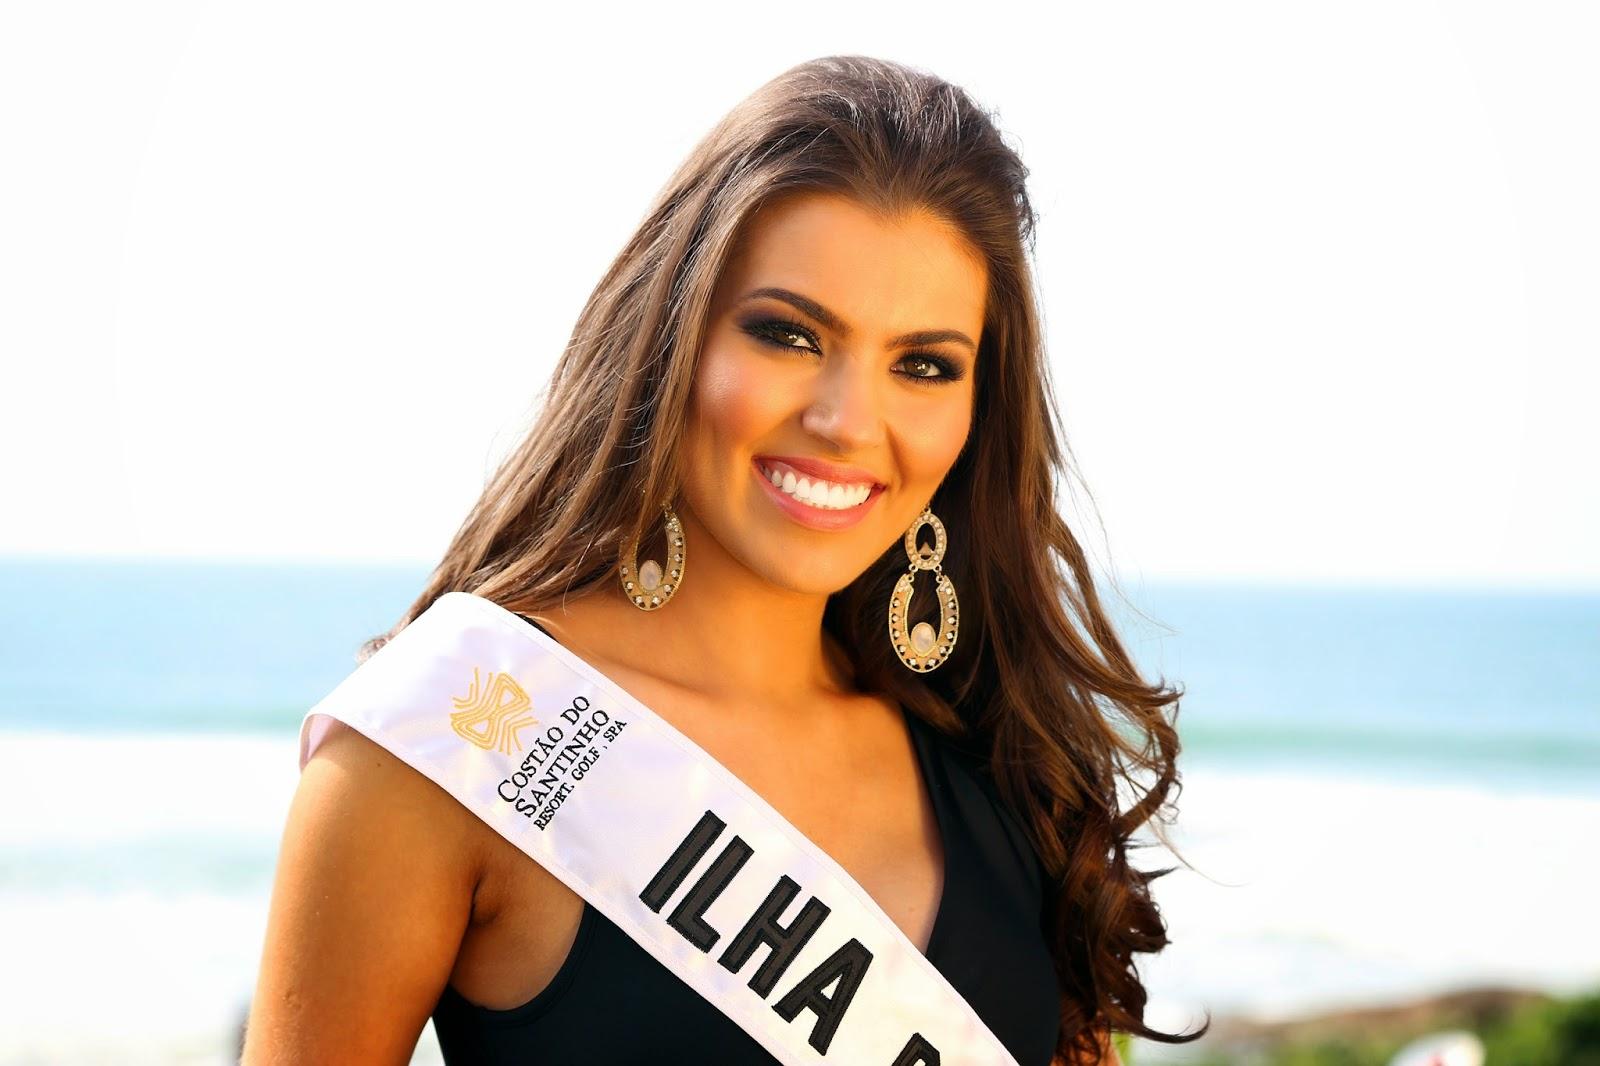 vitoria bisognin, miss brasil rainha internacional do cafe 2015, candidata a miss rio grande do sul universo 2017. Scbqlcmq